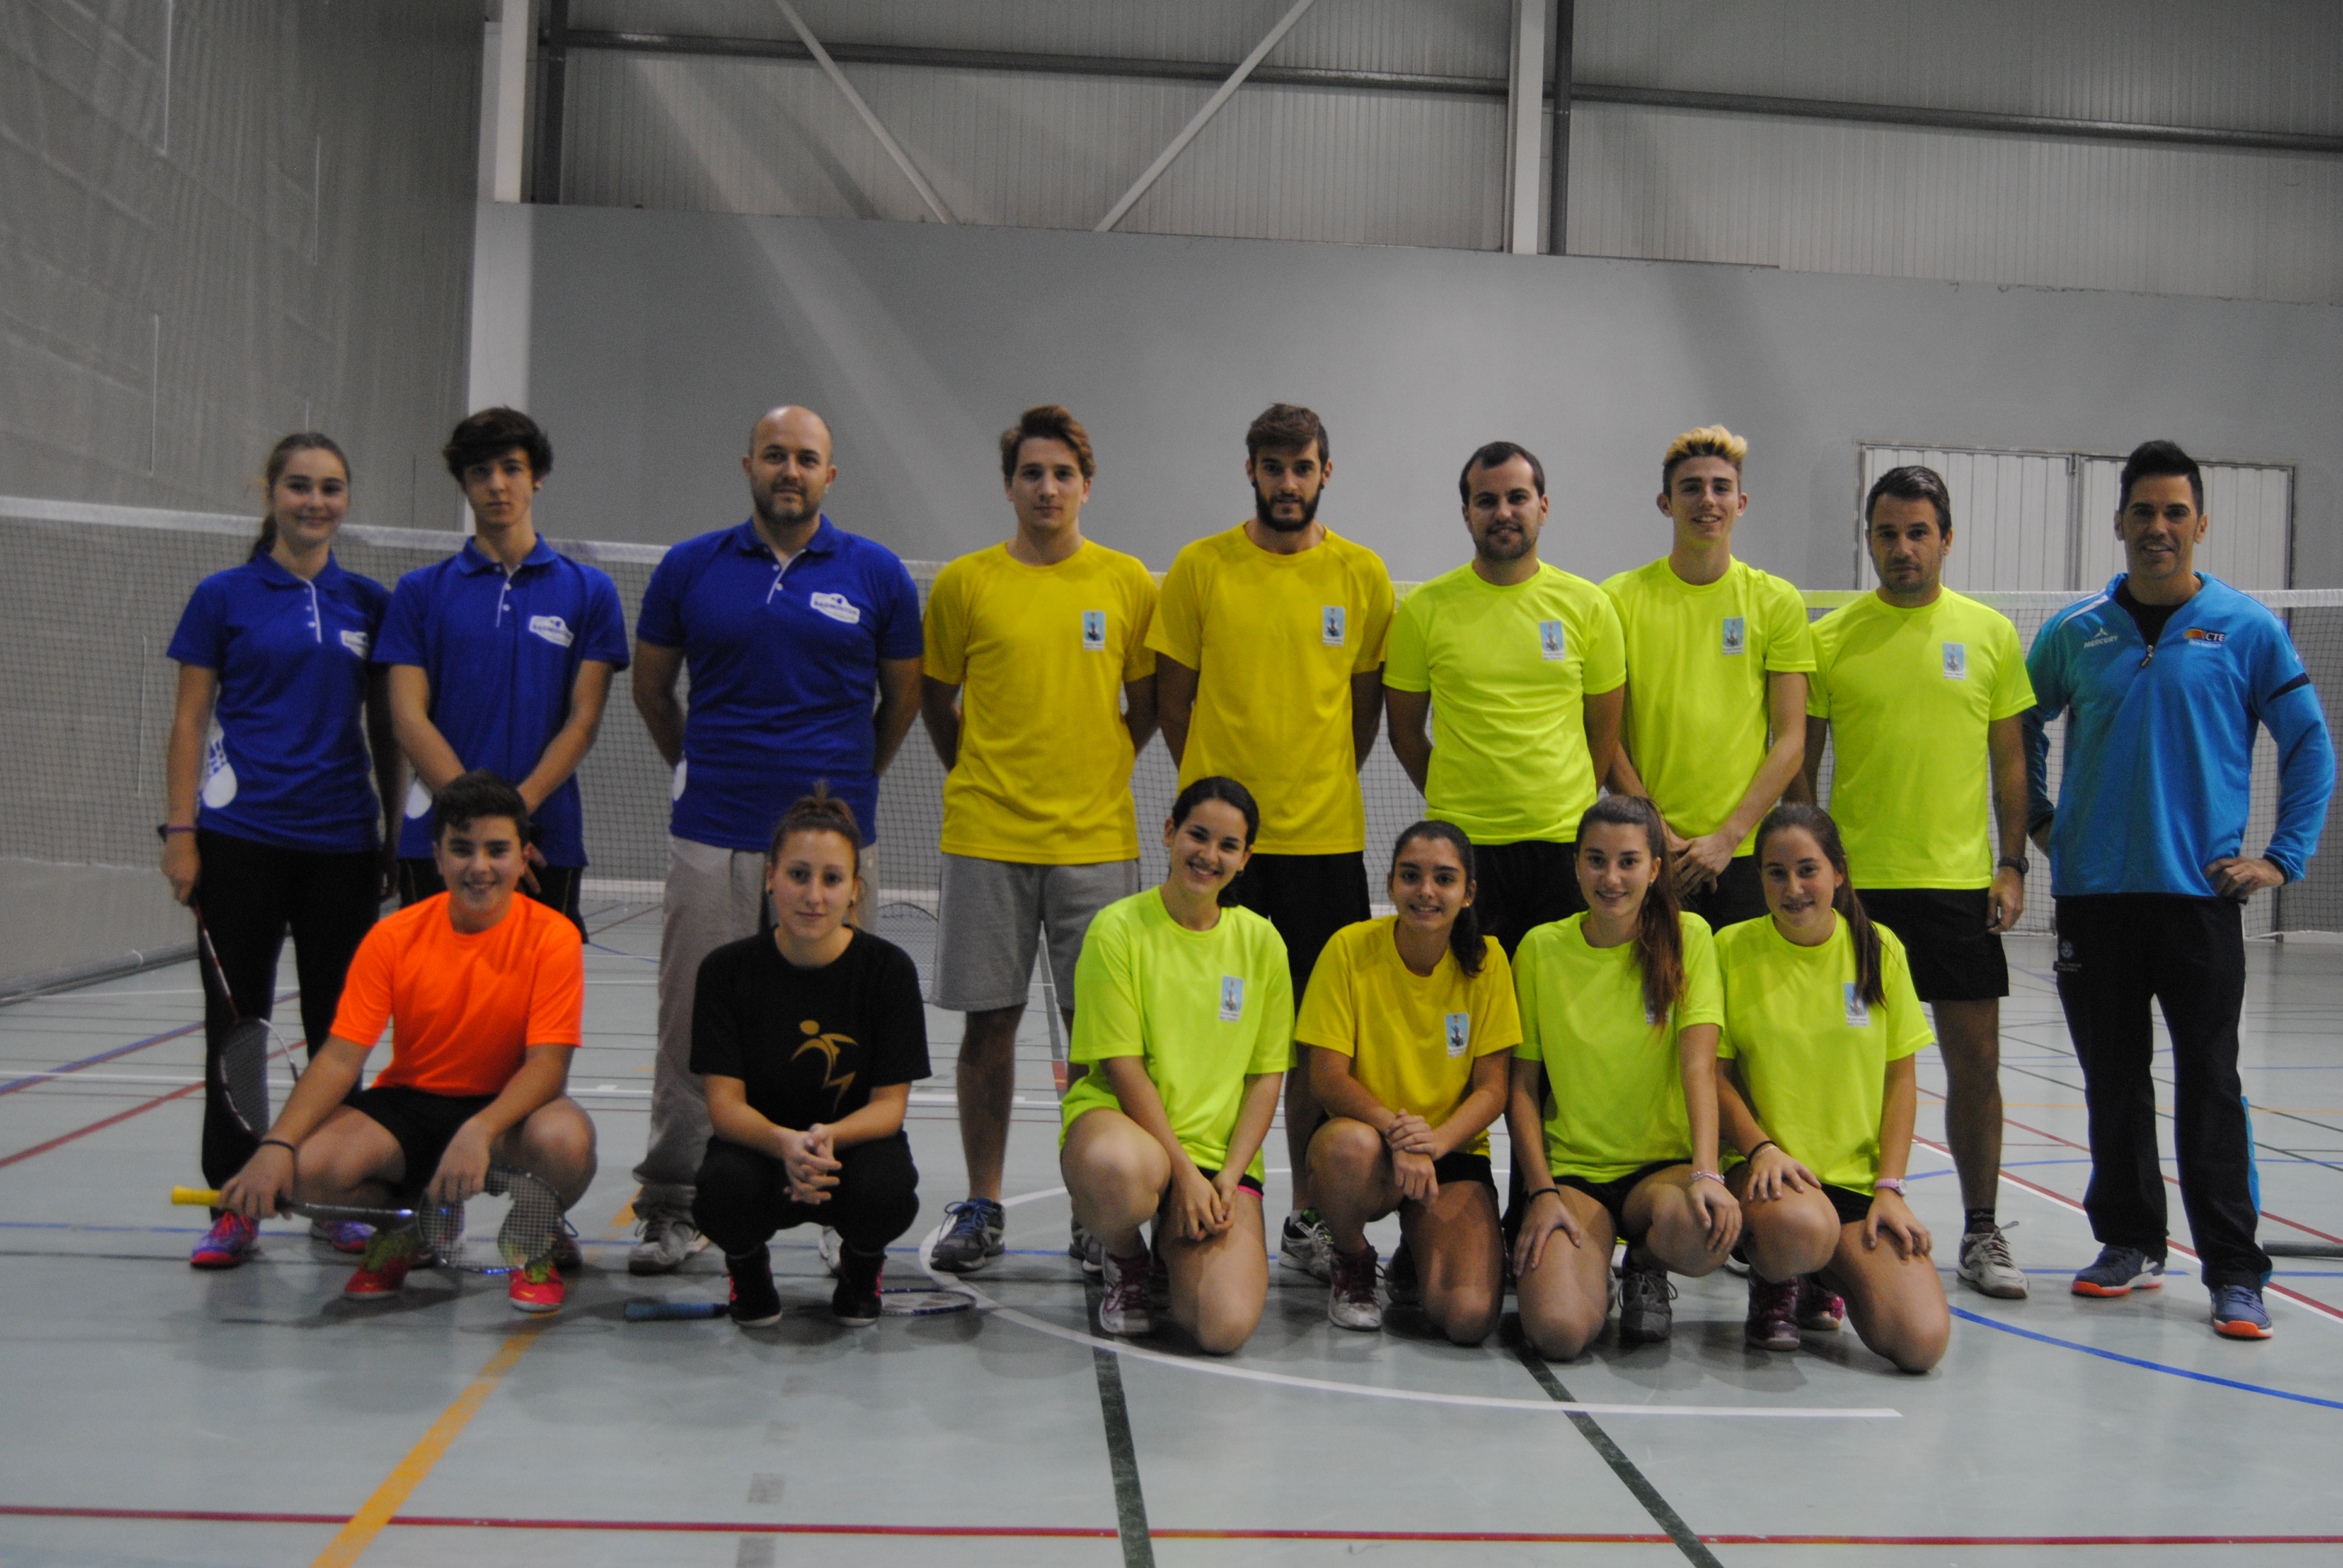 equipos_jornada_1_menorca_badminton_es_castell_vs_cb_ciutadella